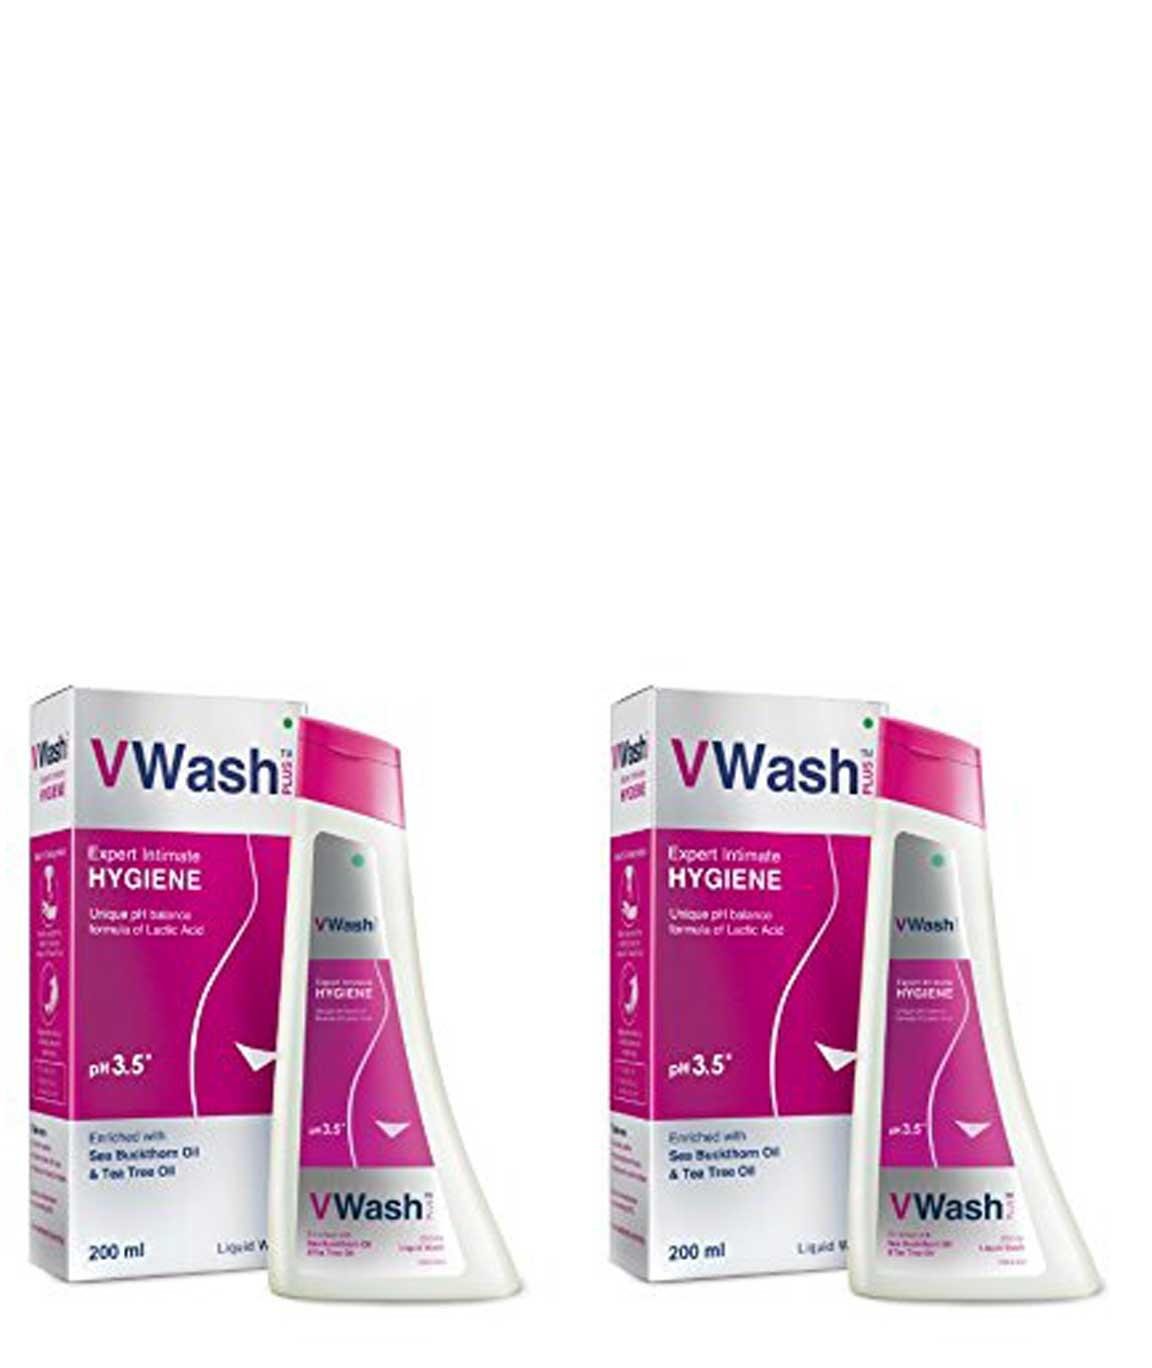 VWash Plus Intimate Hygiene Wash - 200 ml (Pack of 2)